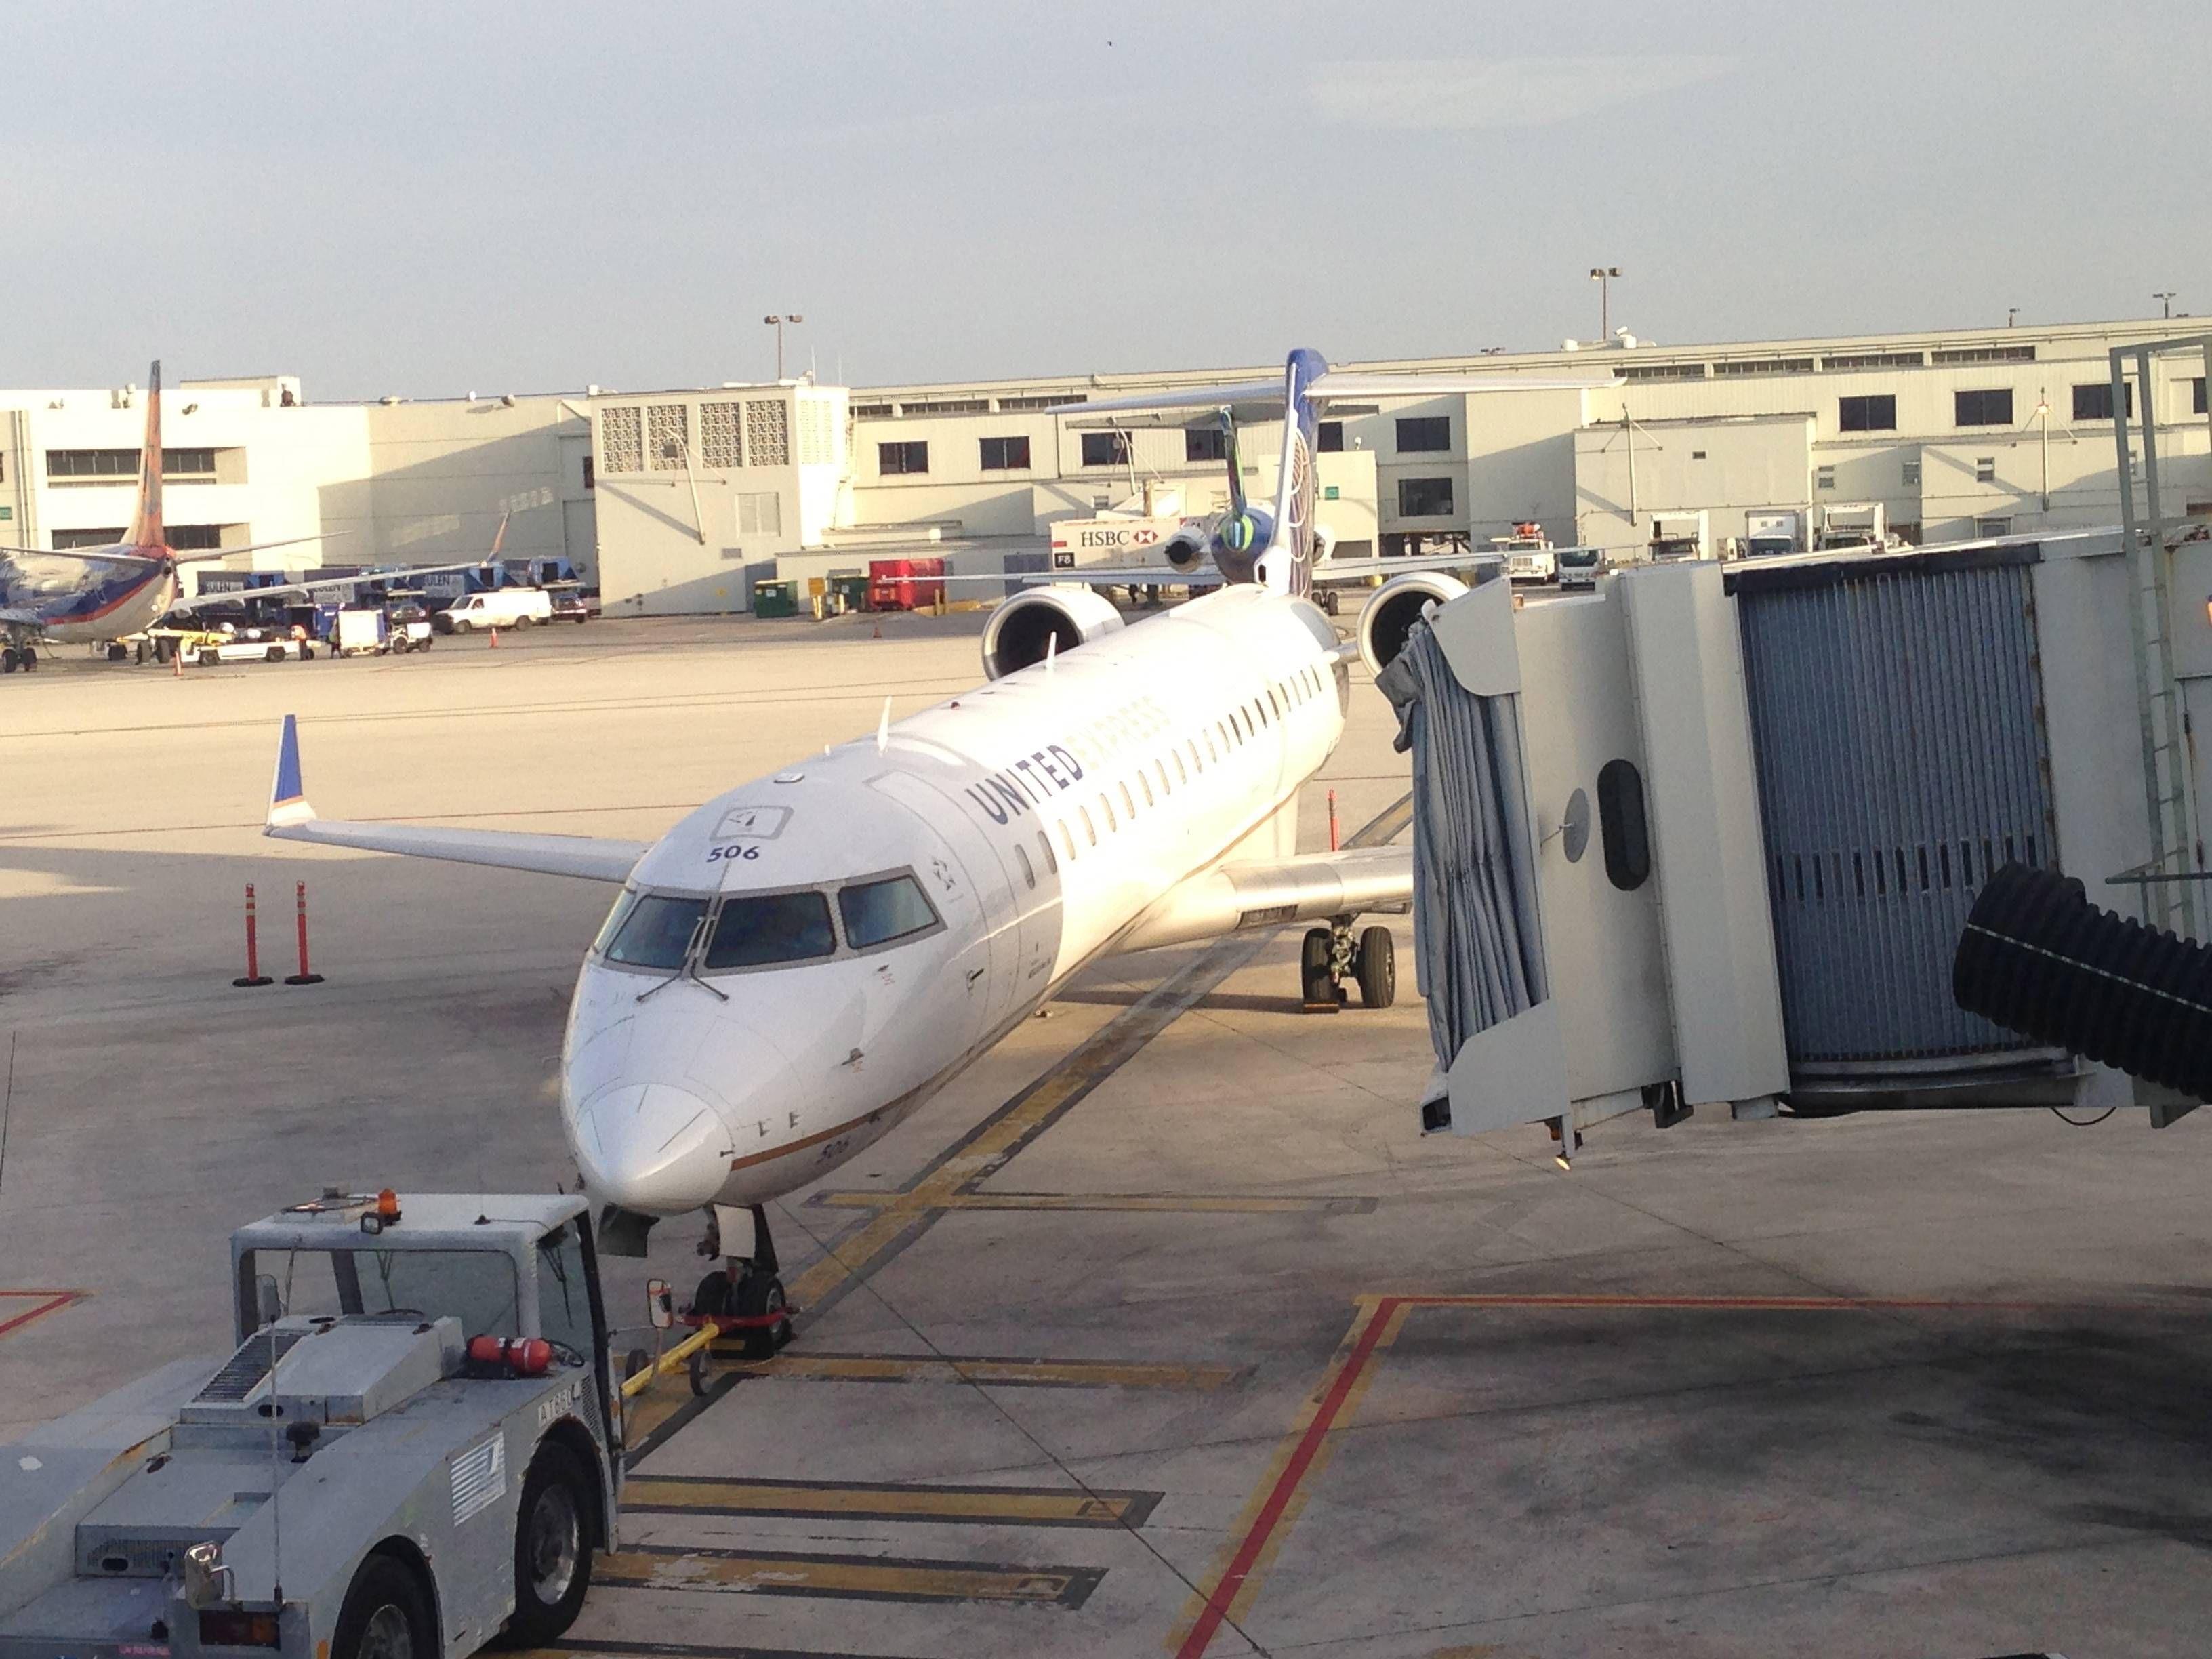 united crj700 first class